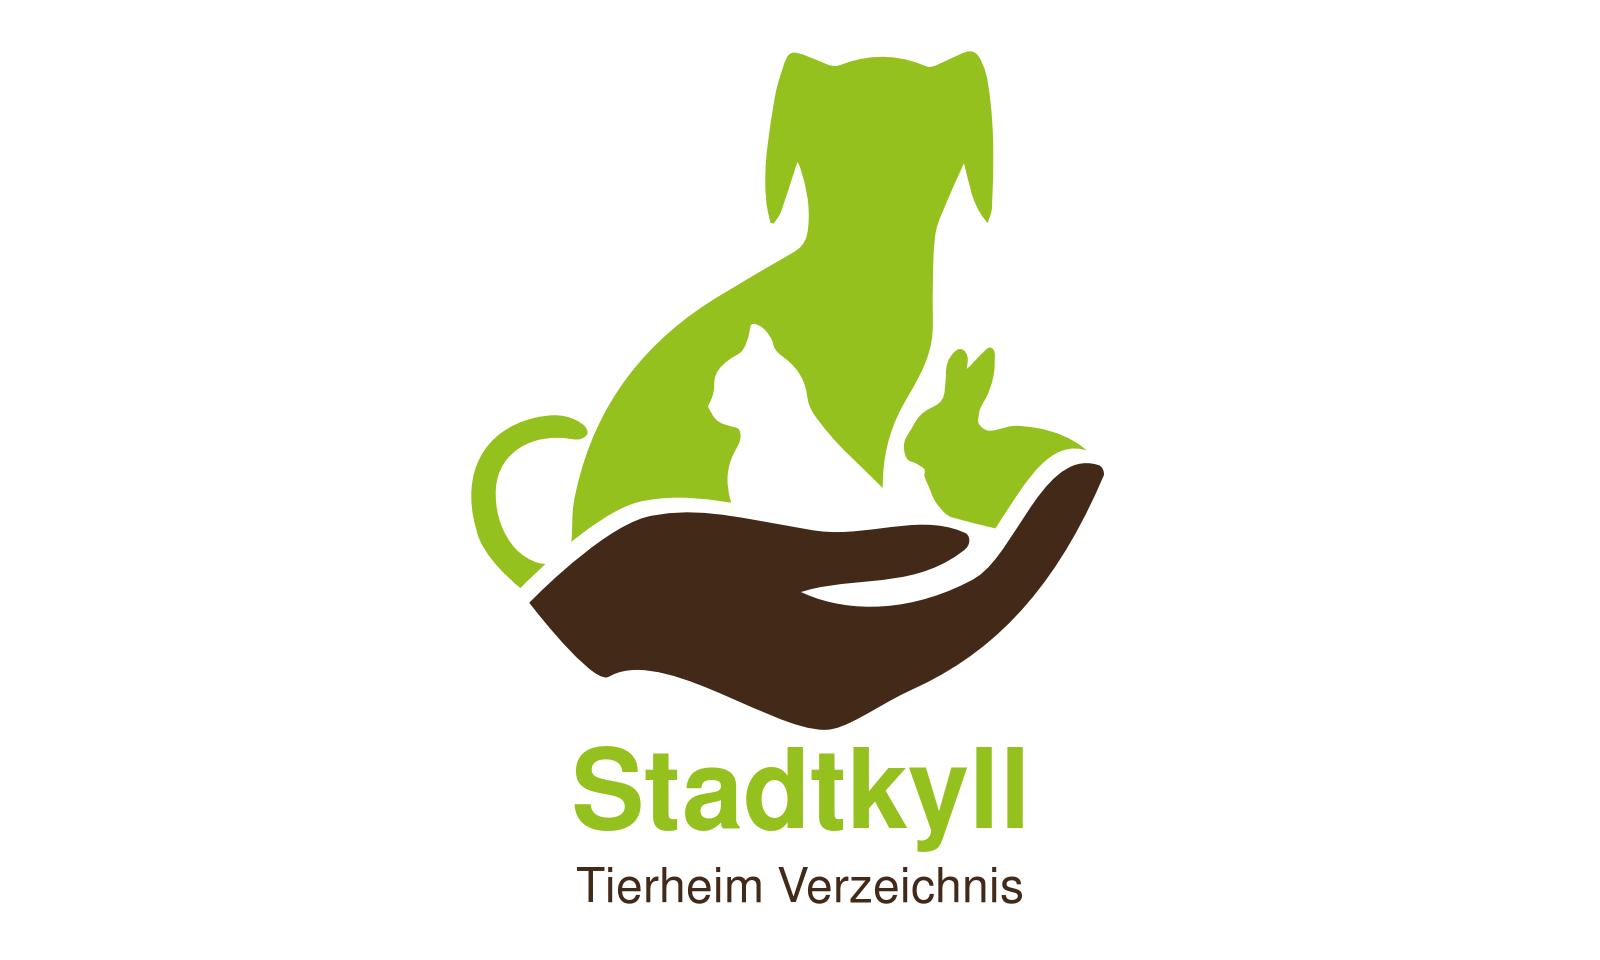 Tierheim Stadtkyll